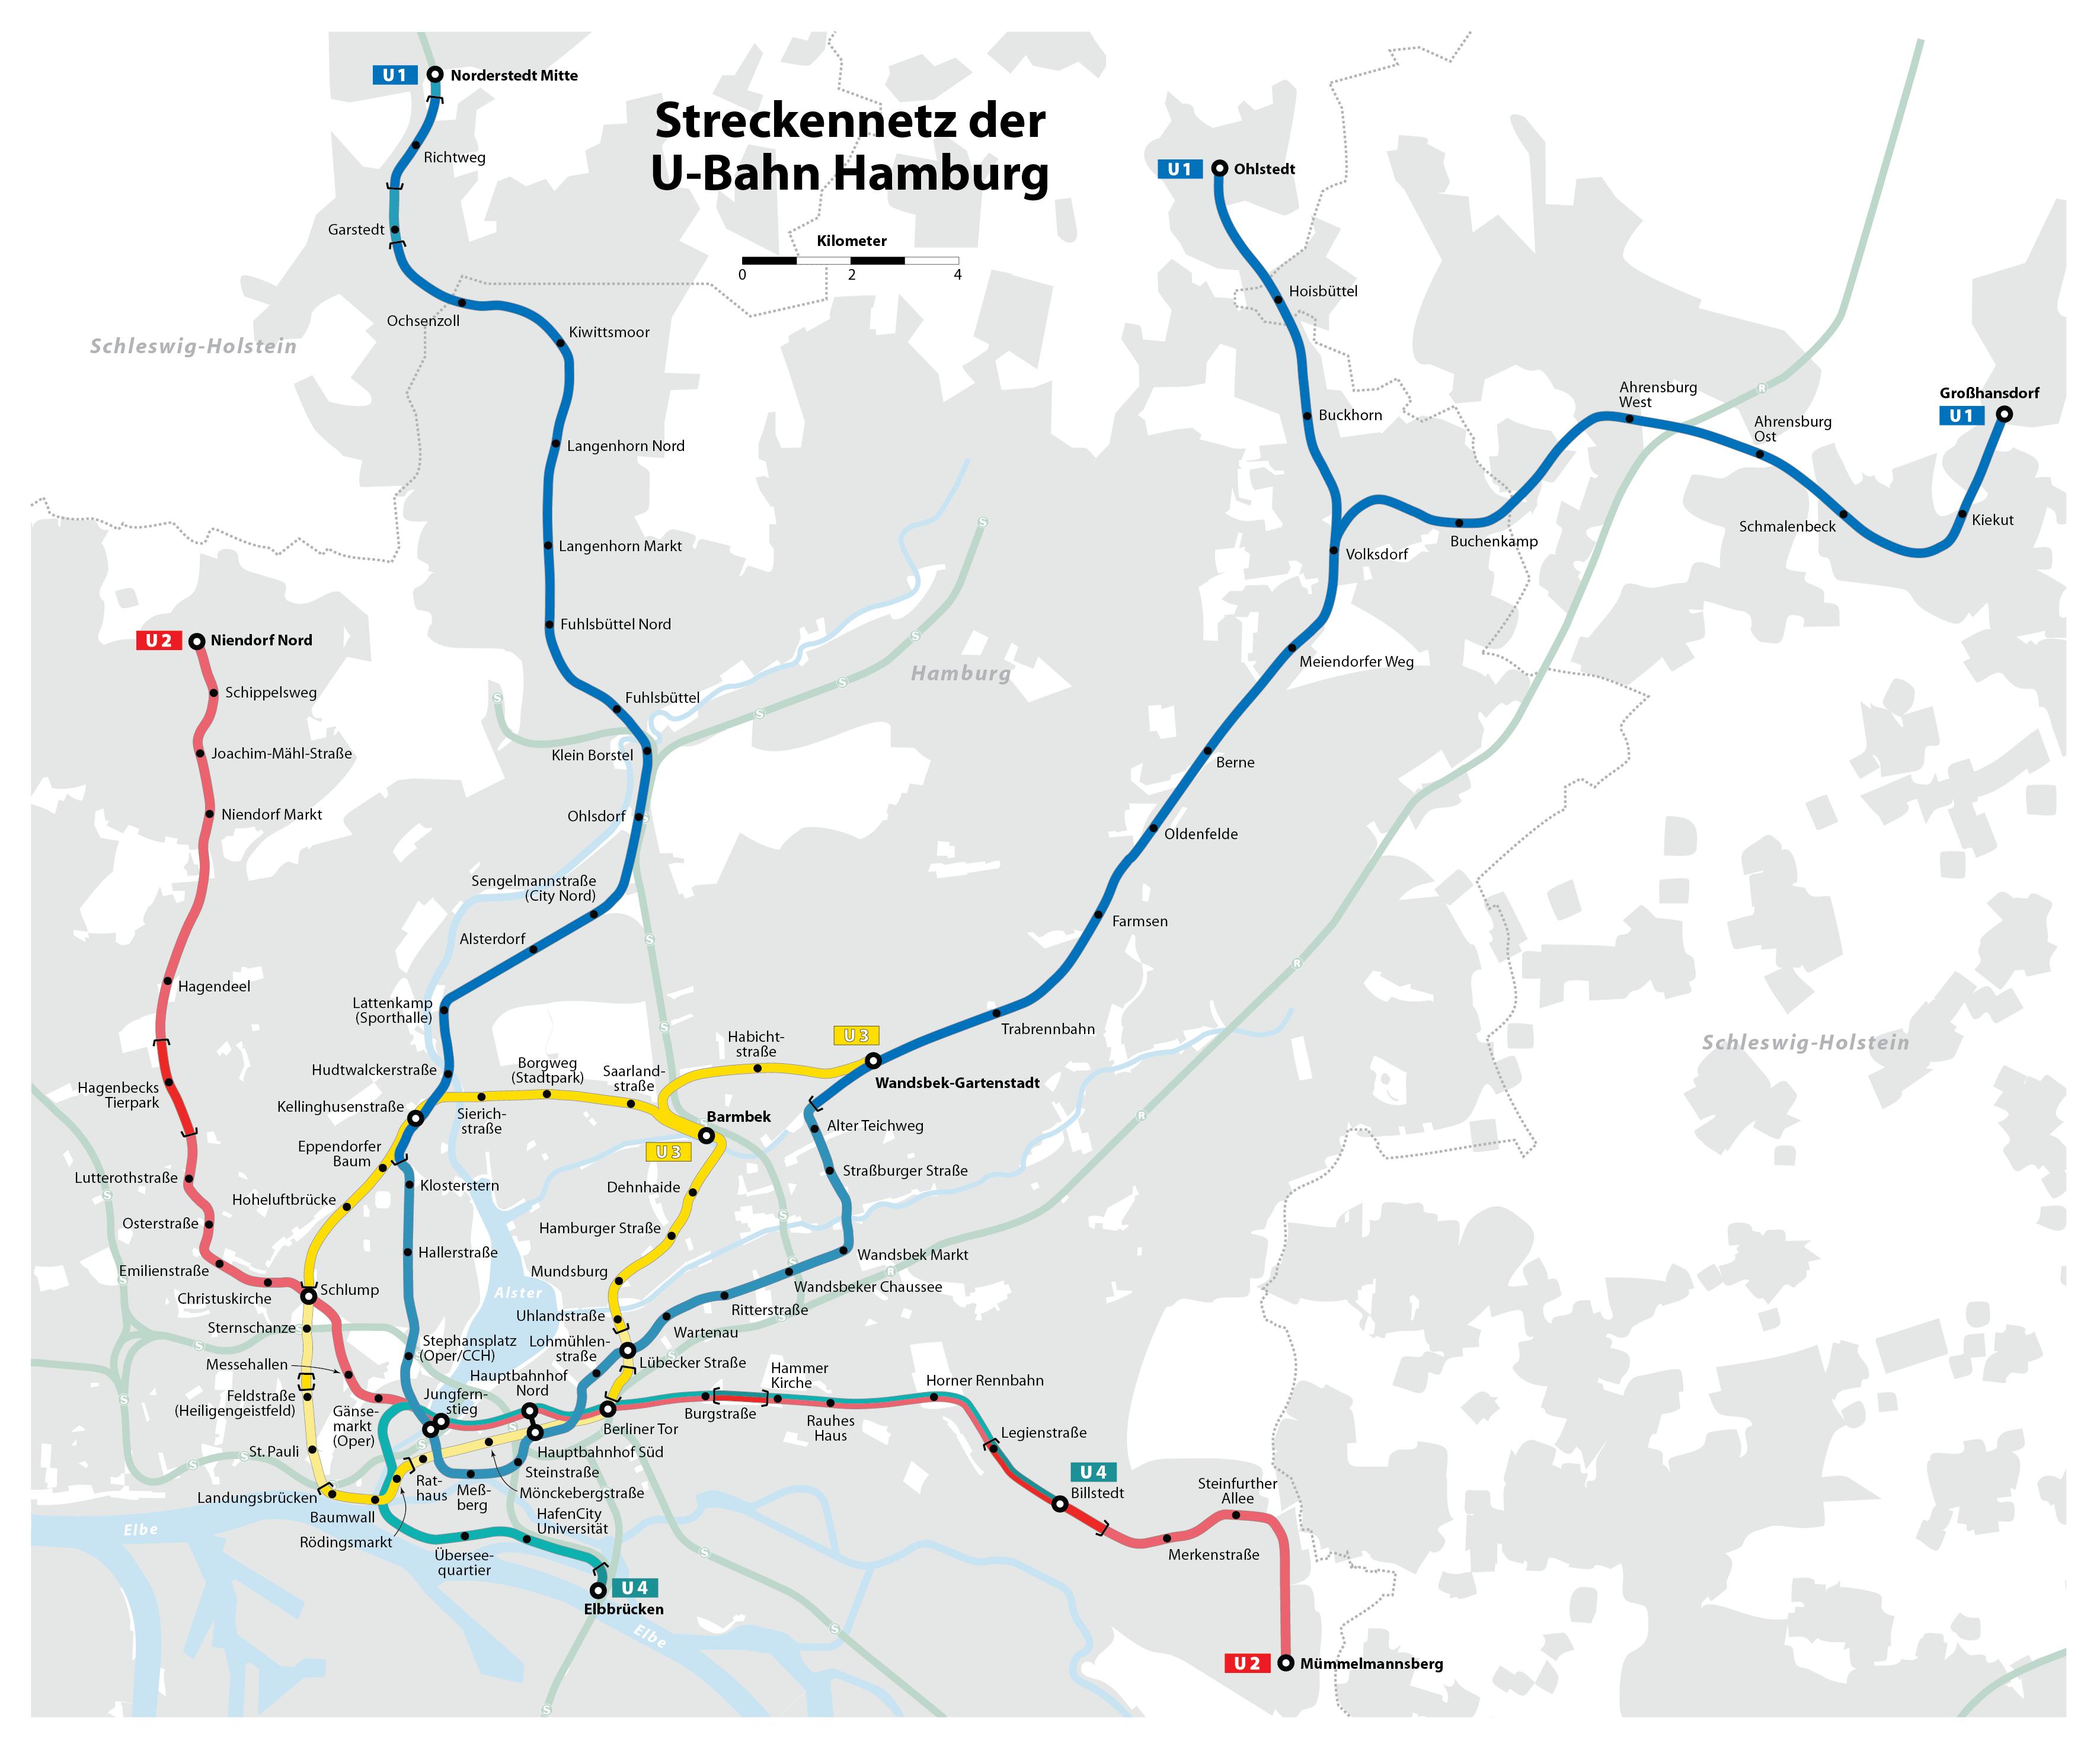 dpd station heppenheim